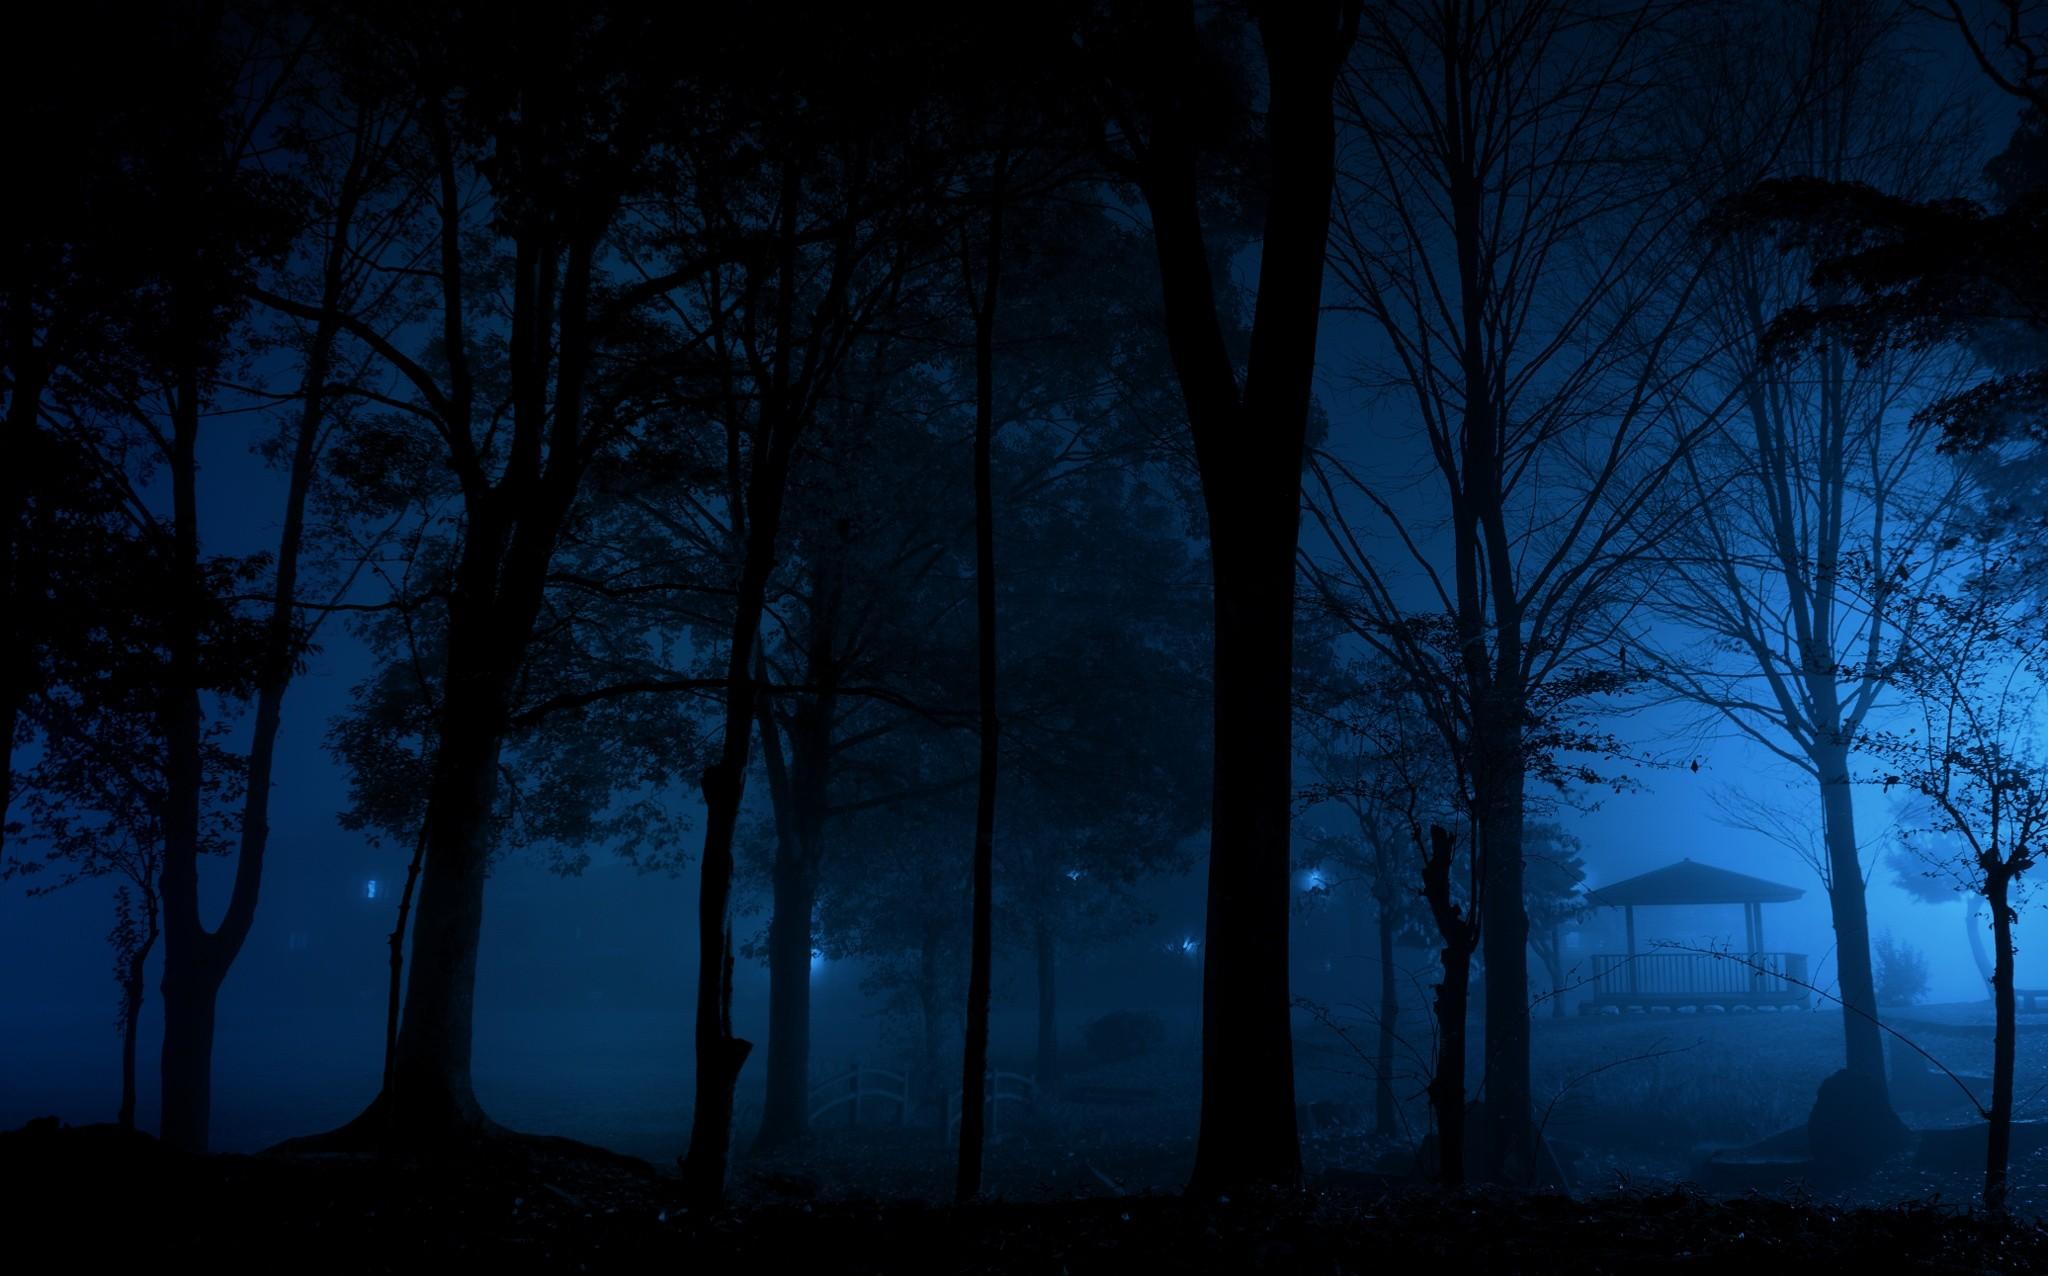 Night in the Forest Fond d'écran HD | Arrière-Plan | 2048x1276 | ID:729095 - Wallpaper Abyss